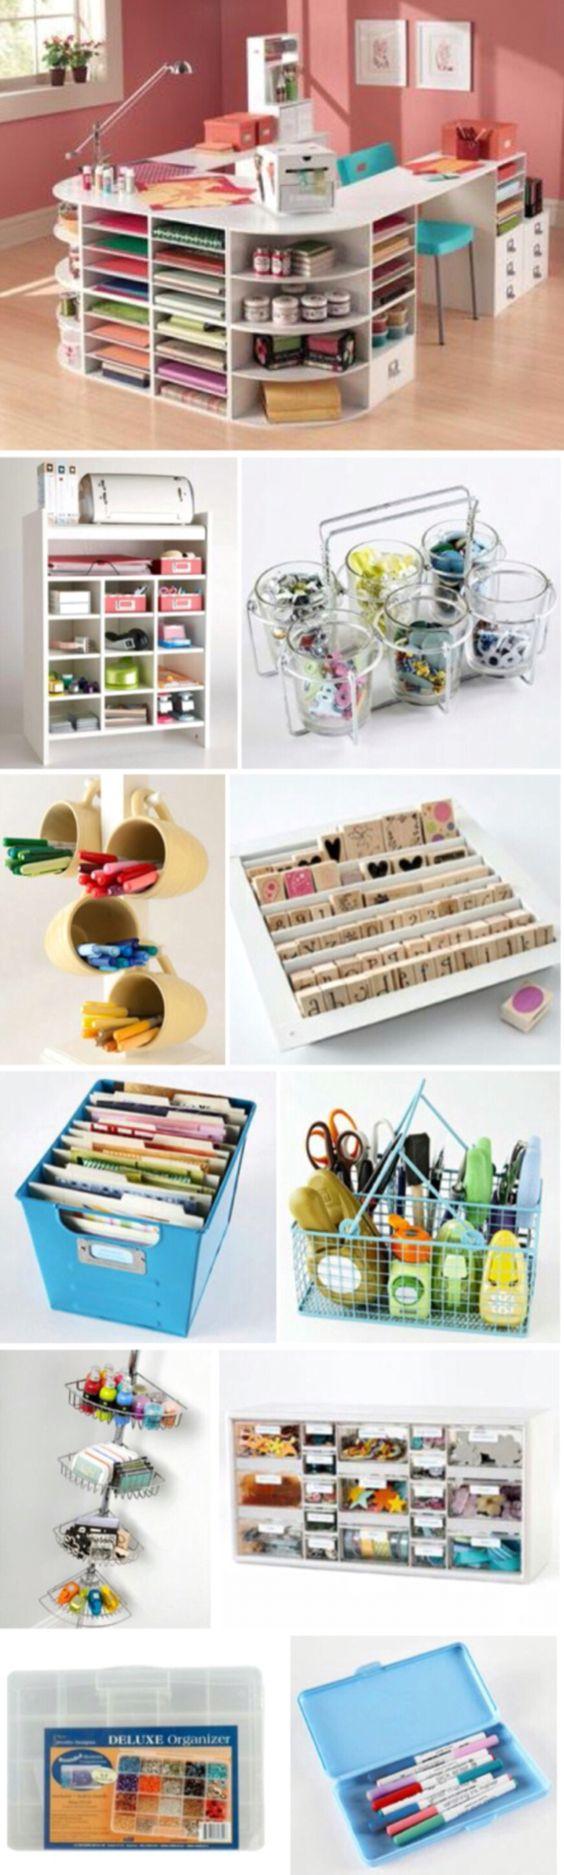 10-craft-storage-ideas-on-a-budget